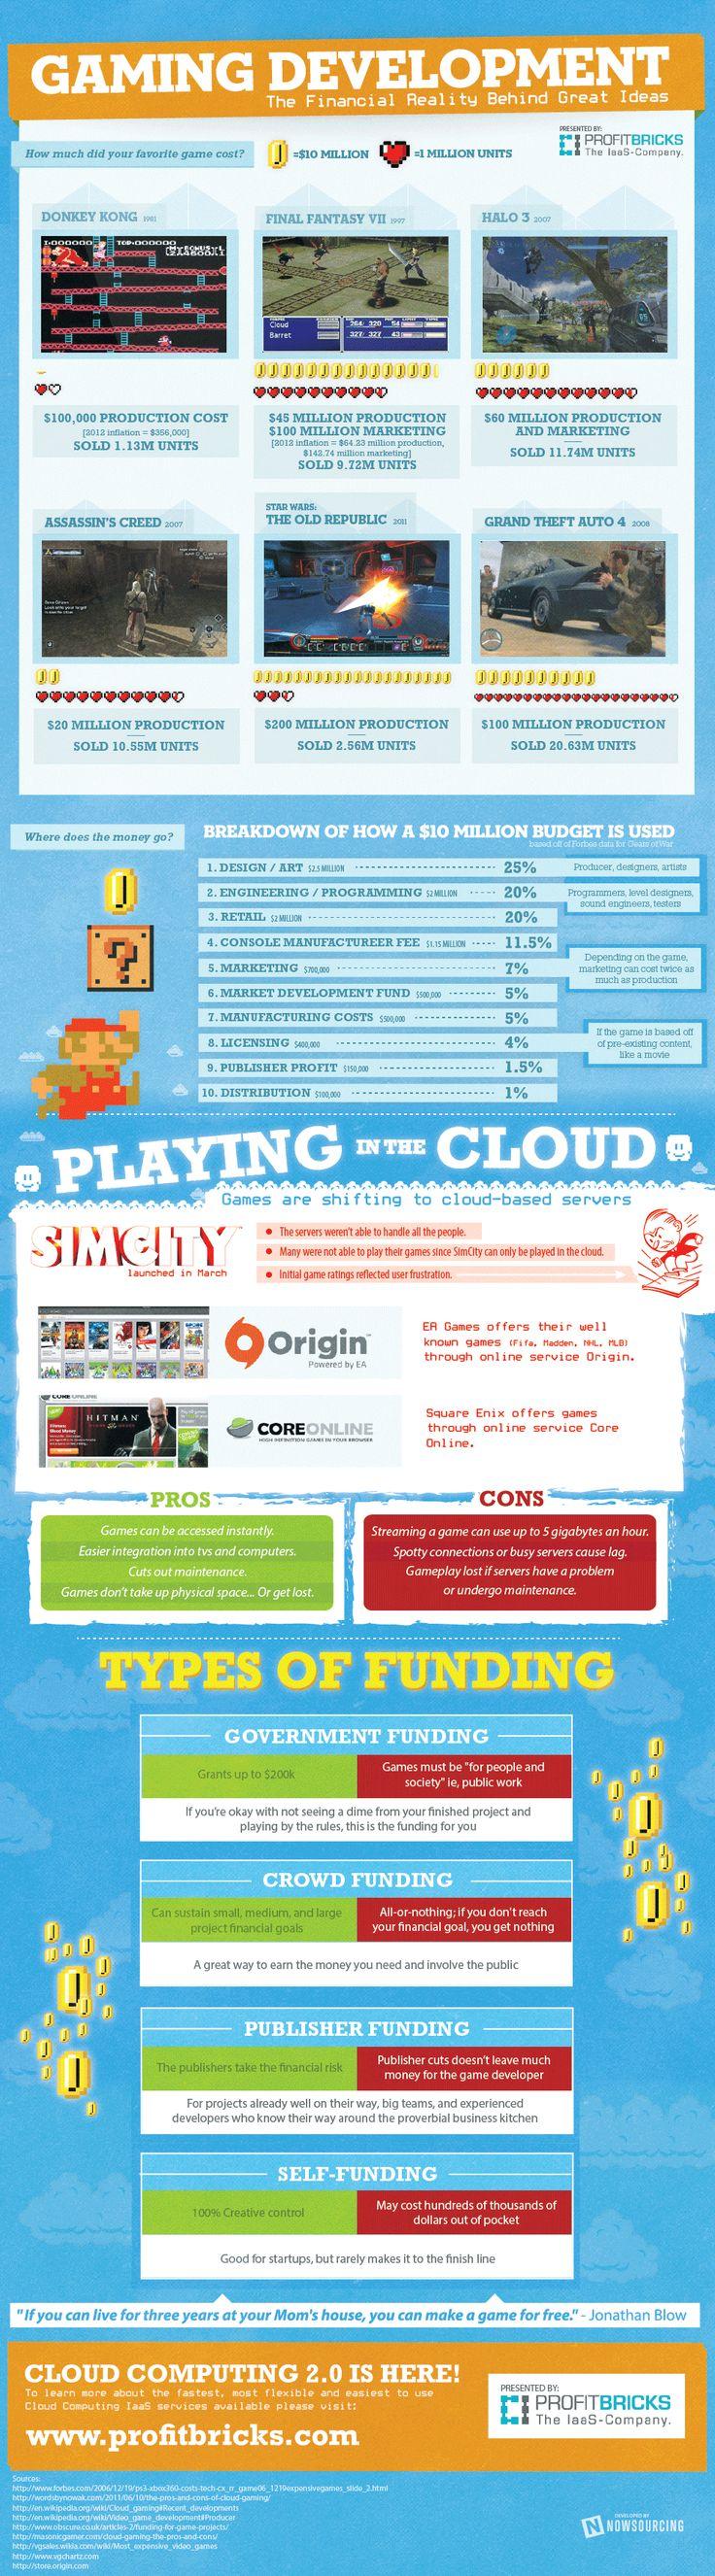 ProfitBricks-Game-Developmen-Financial-Reality-Infographic3.png (975×3514)